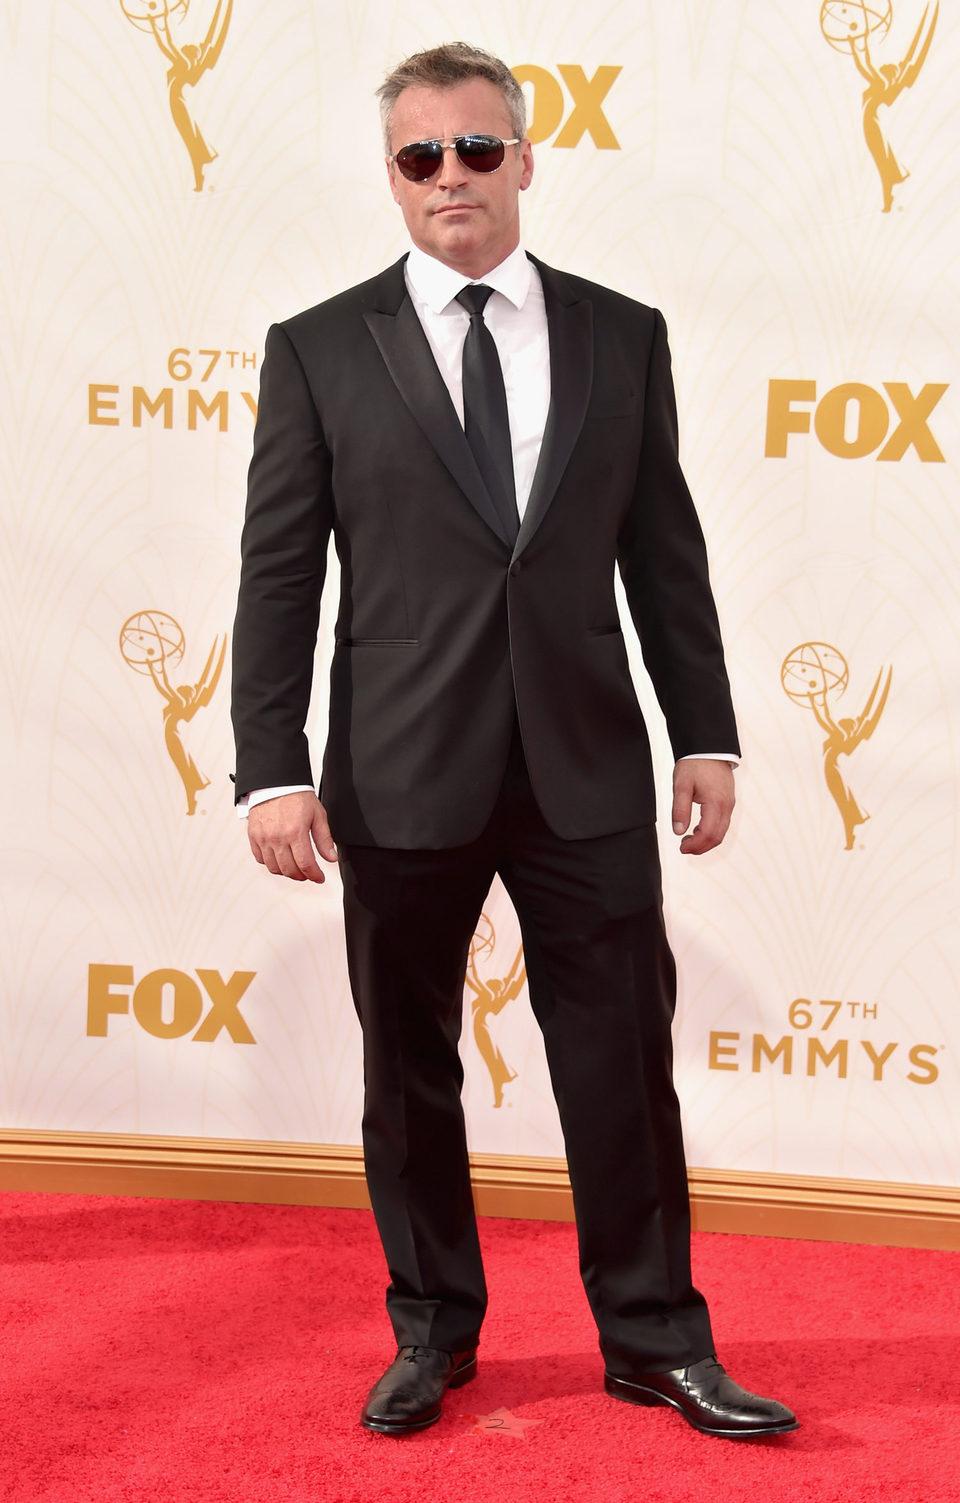 Matt LeBlanc en la alfombra roja de los Premios Emmy 2015